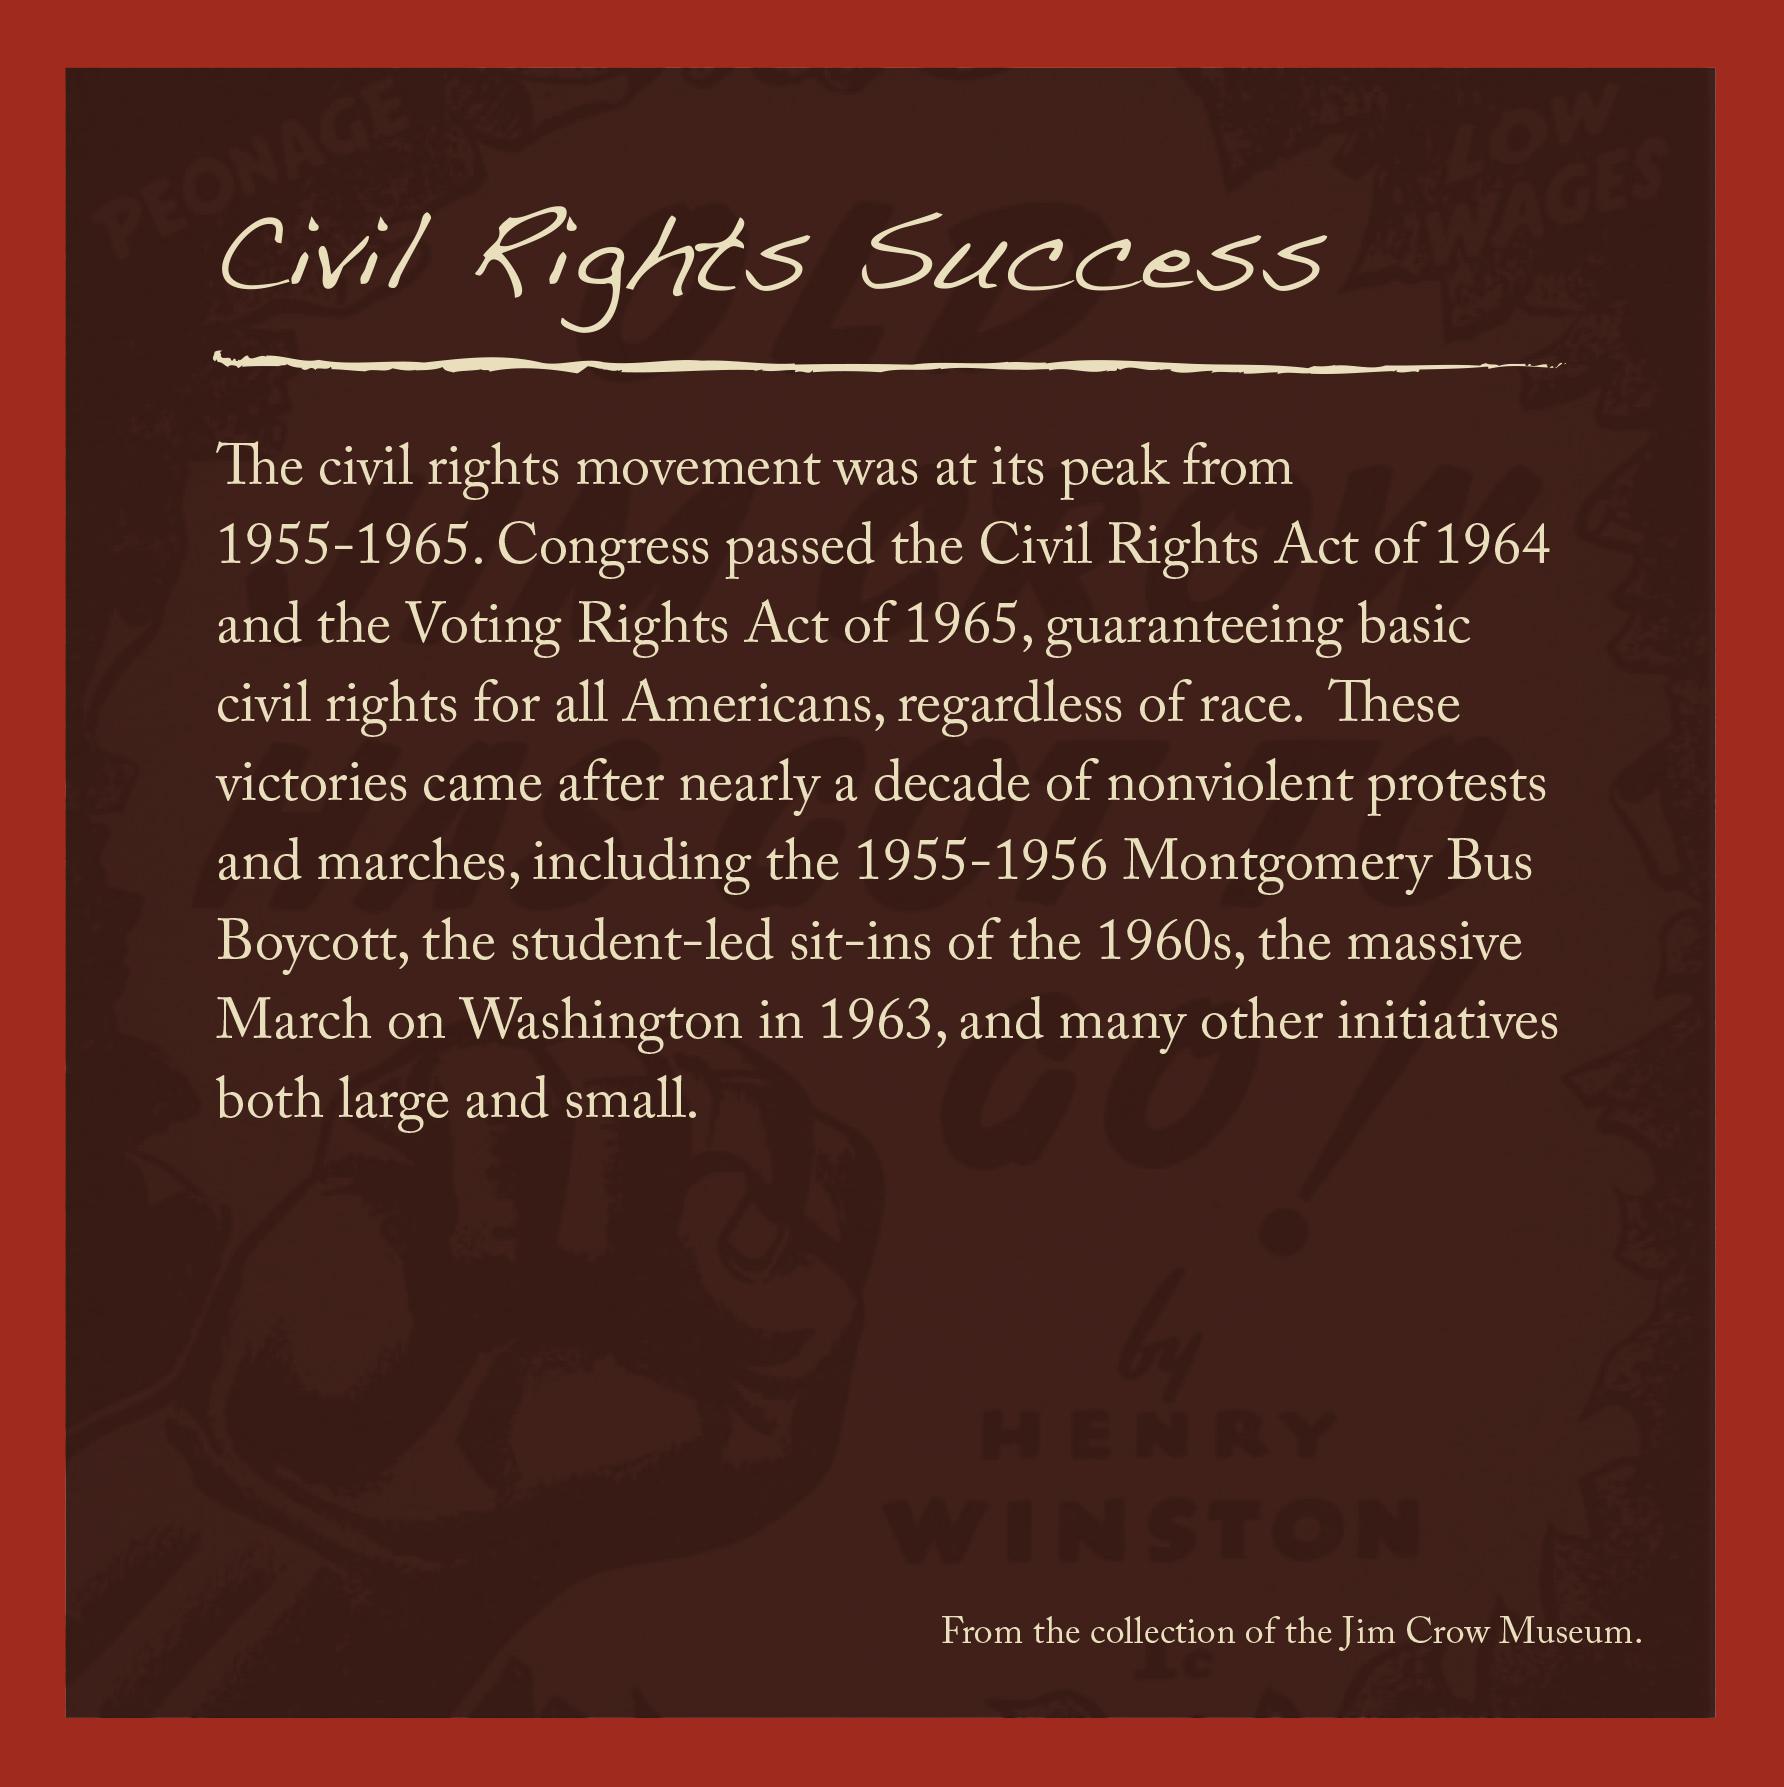 Civil Right Success.jpg